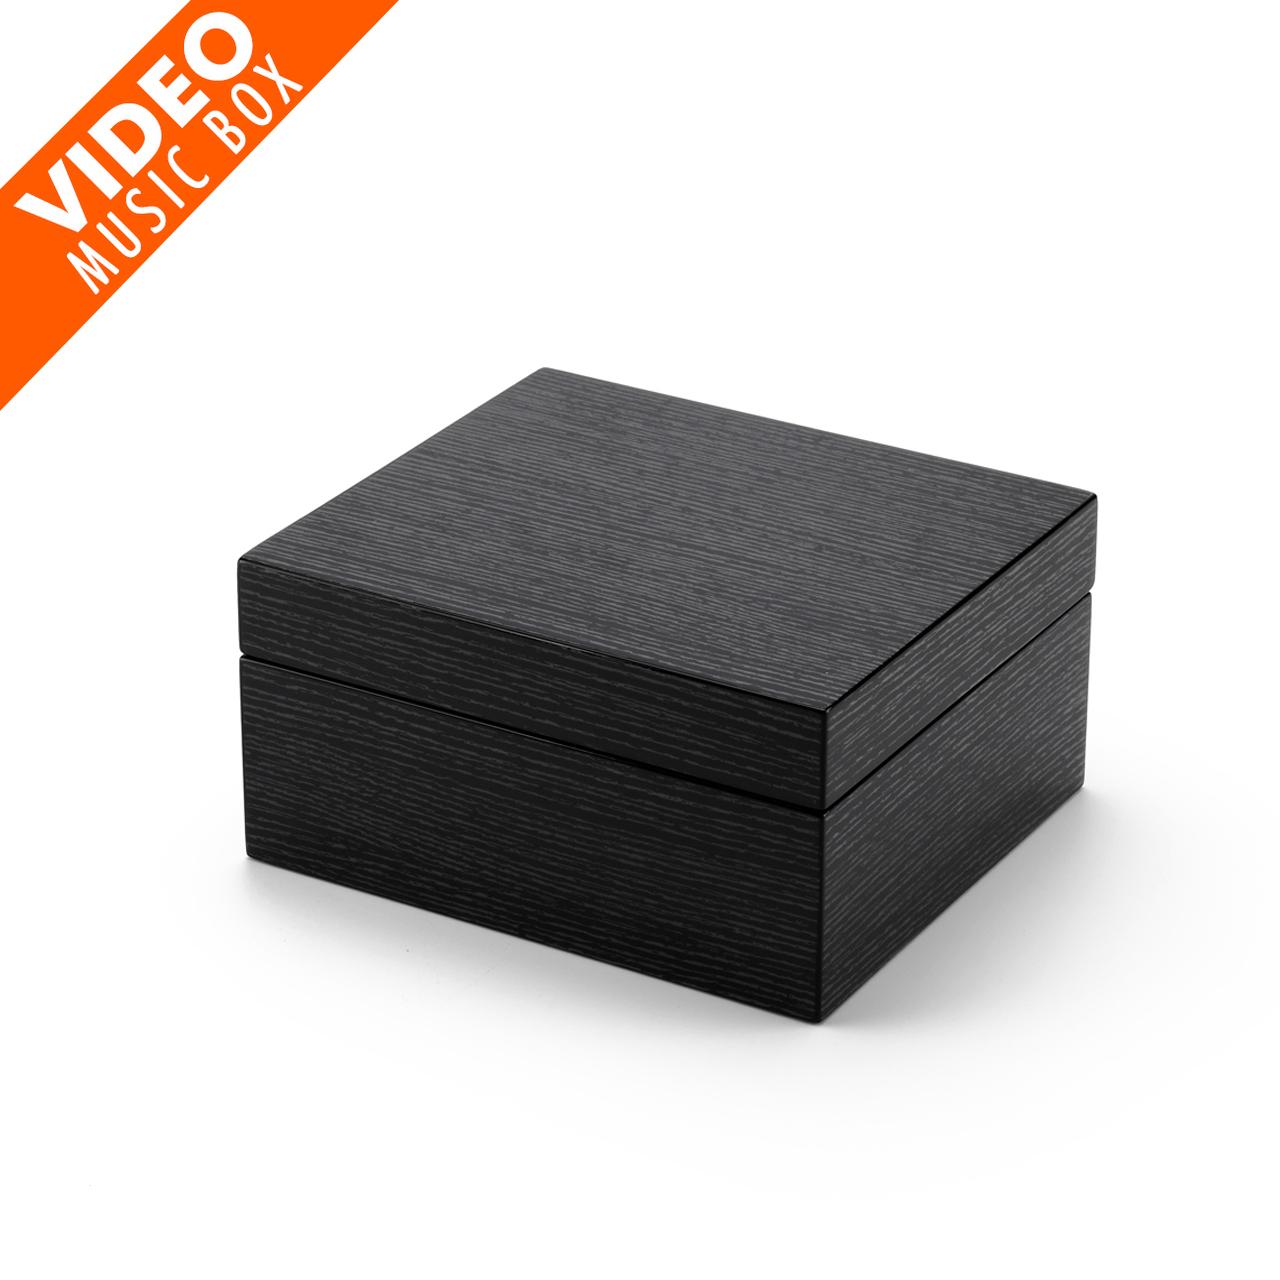 Ultra-Modern Hi Gloss Black Apricot Finish 3.6 LCD Video Jewelry Box